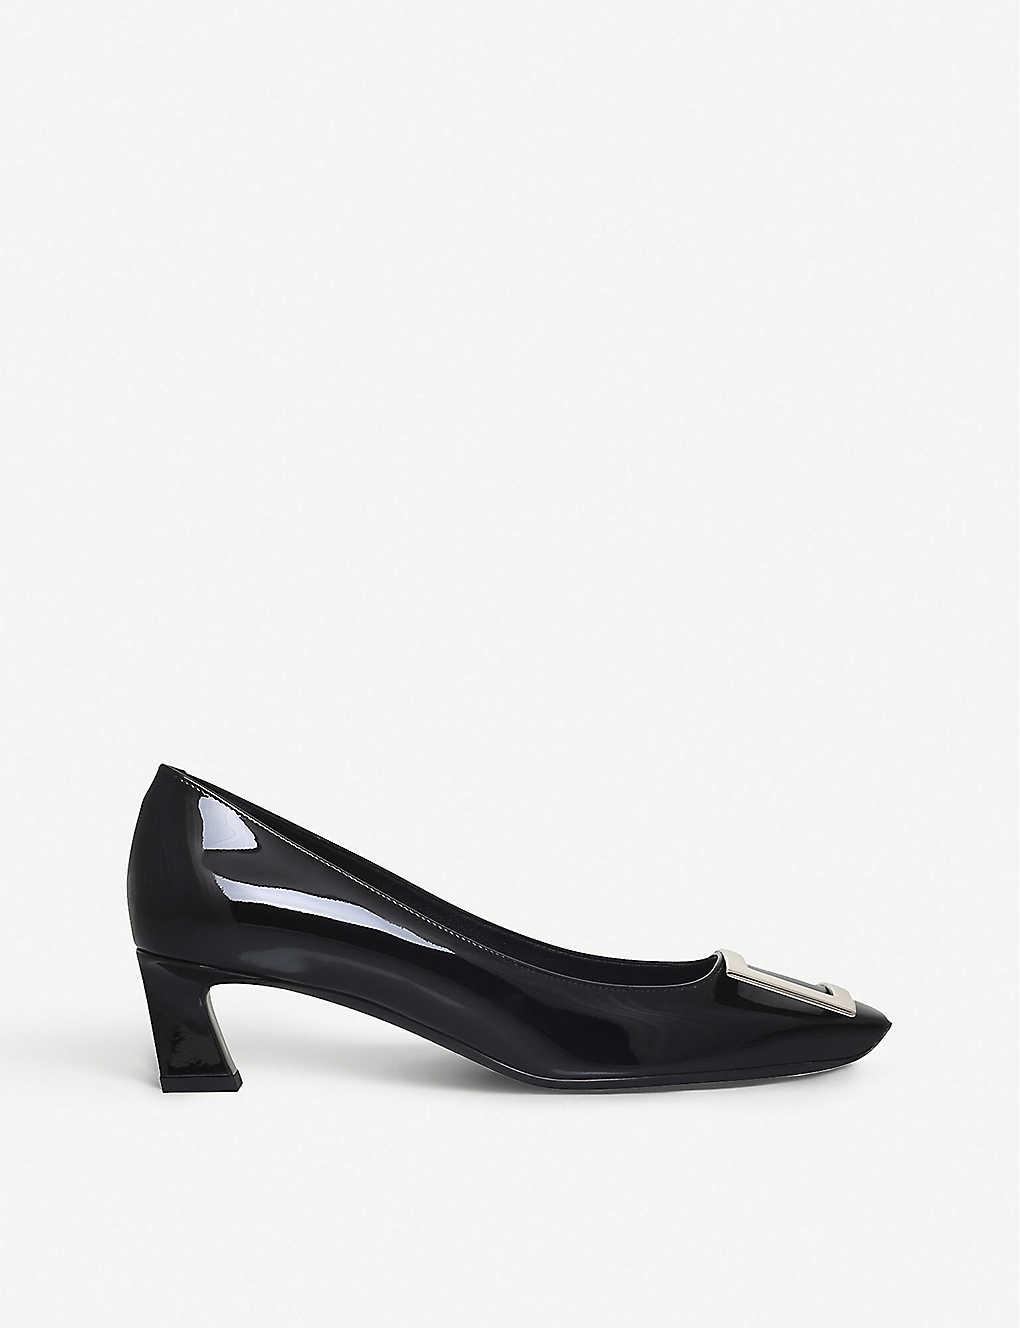 Belle Vivier leather high heels(5737614)